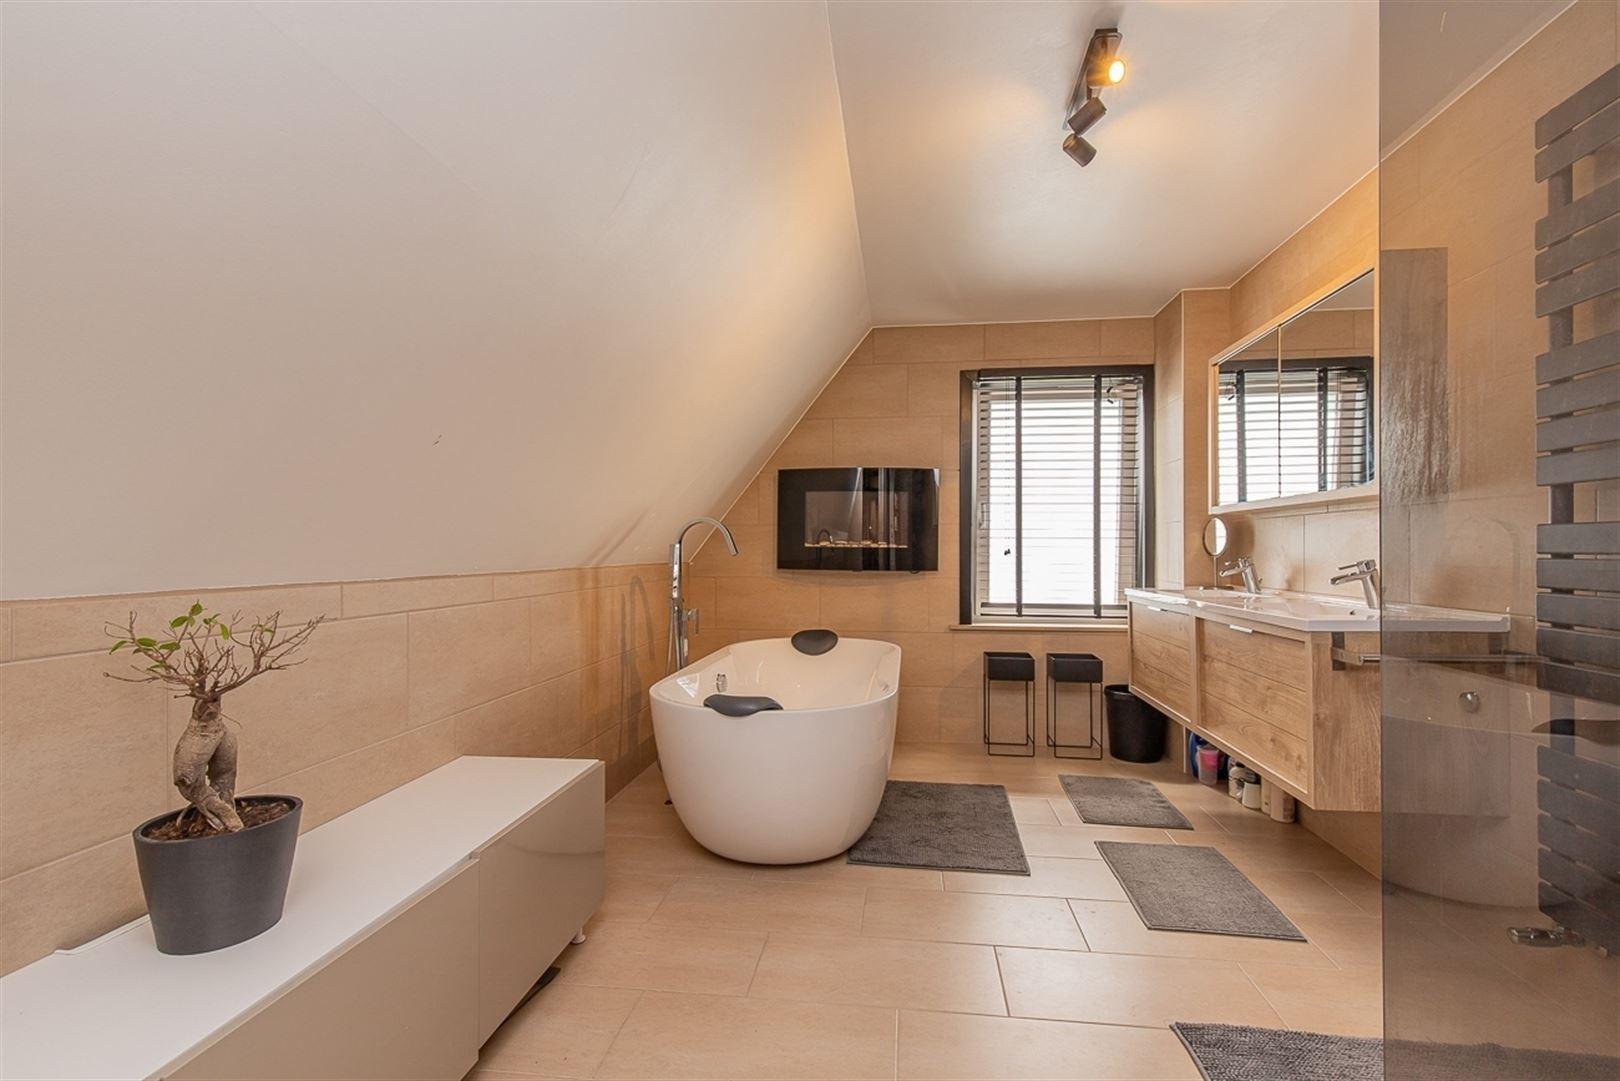 Foto 17 : Villa te 9100 SINT-NIKLAAS (België) - Prijs € 549.000